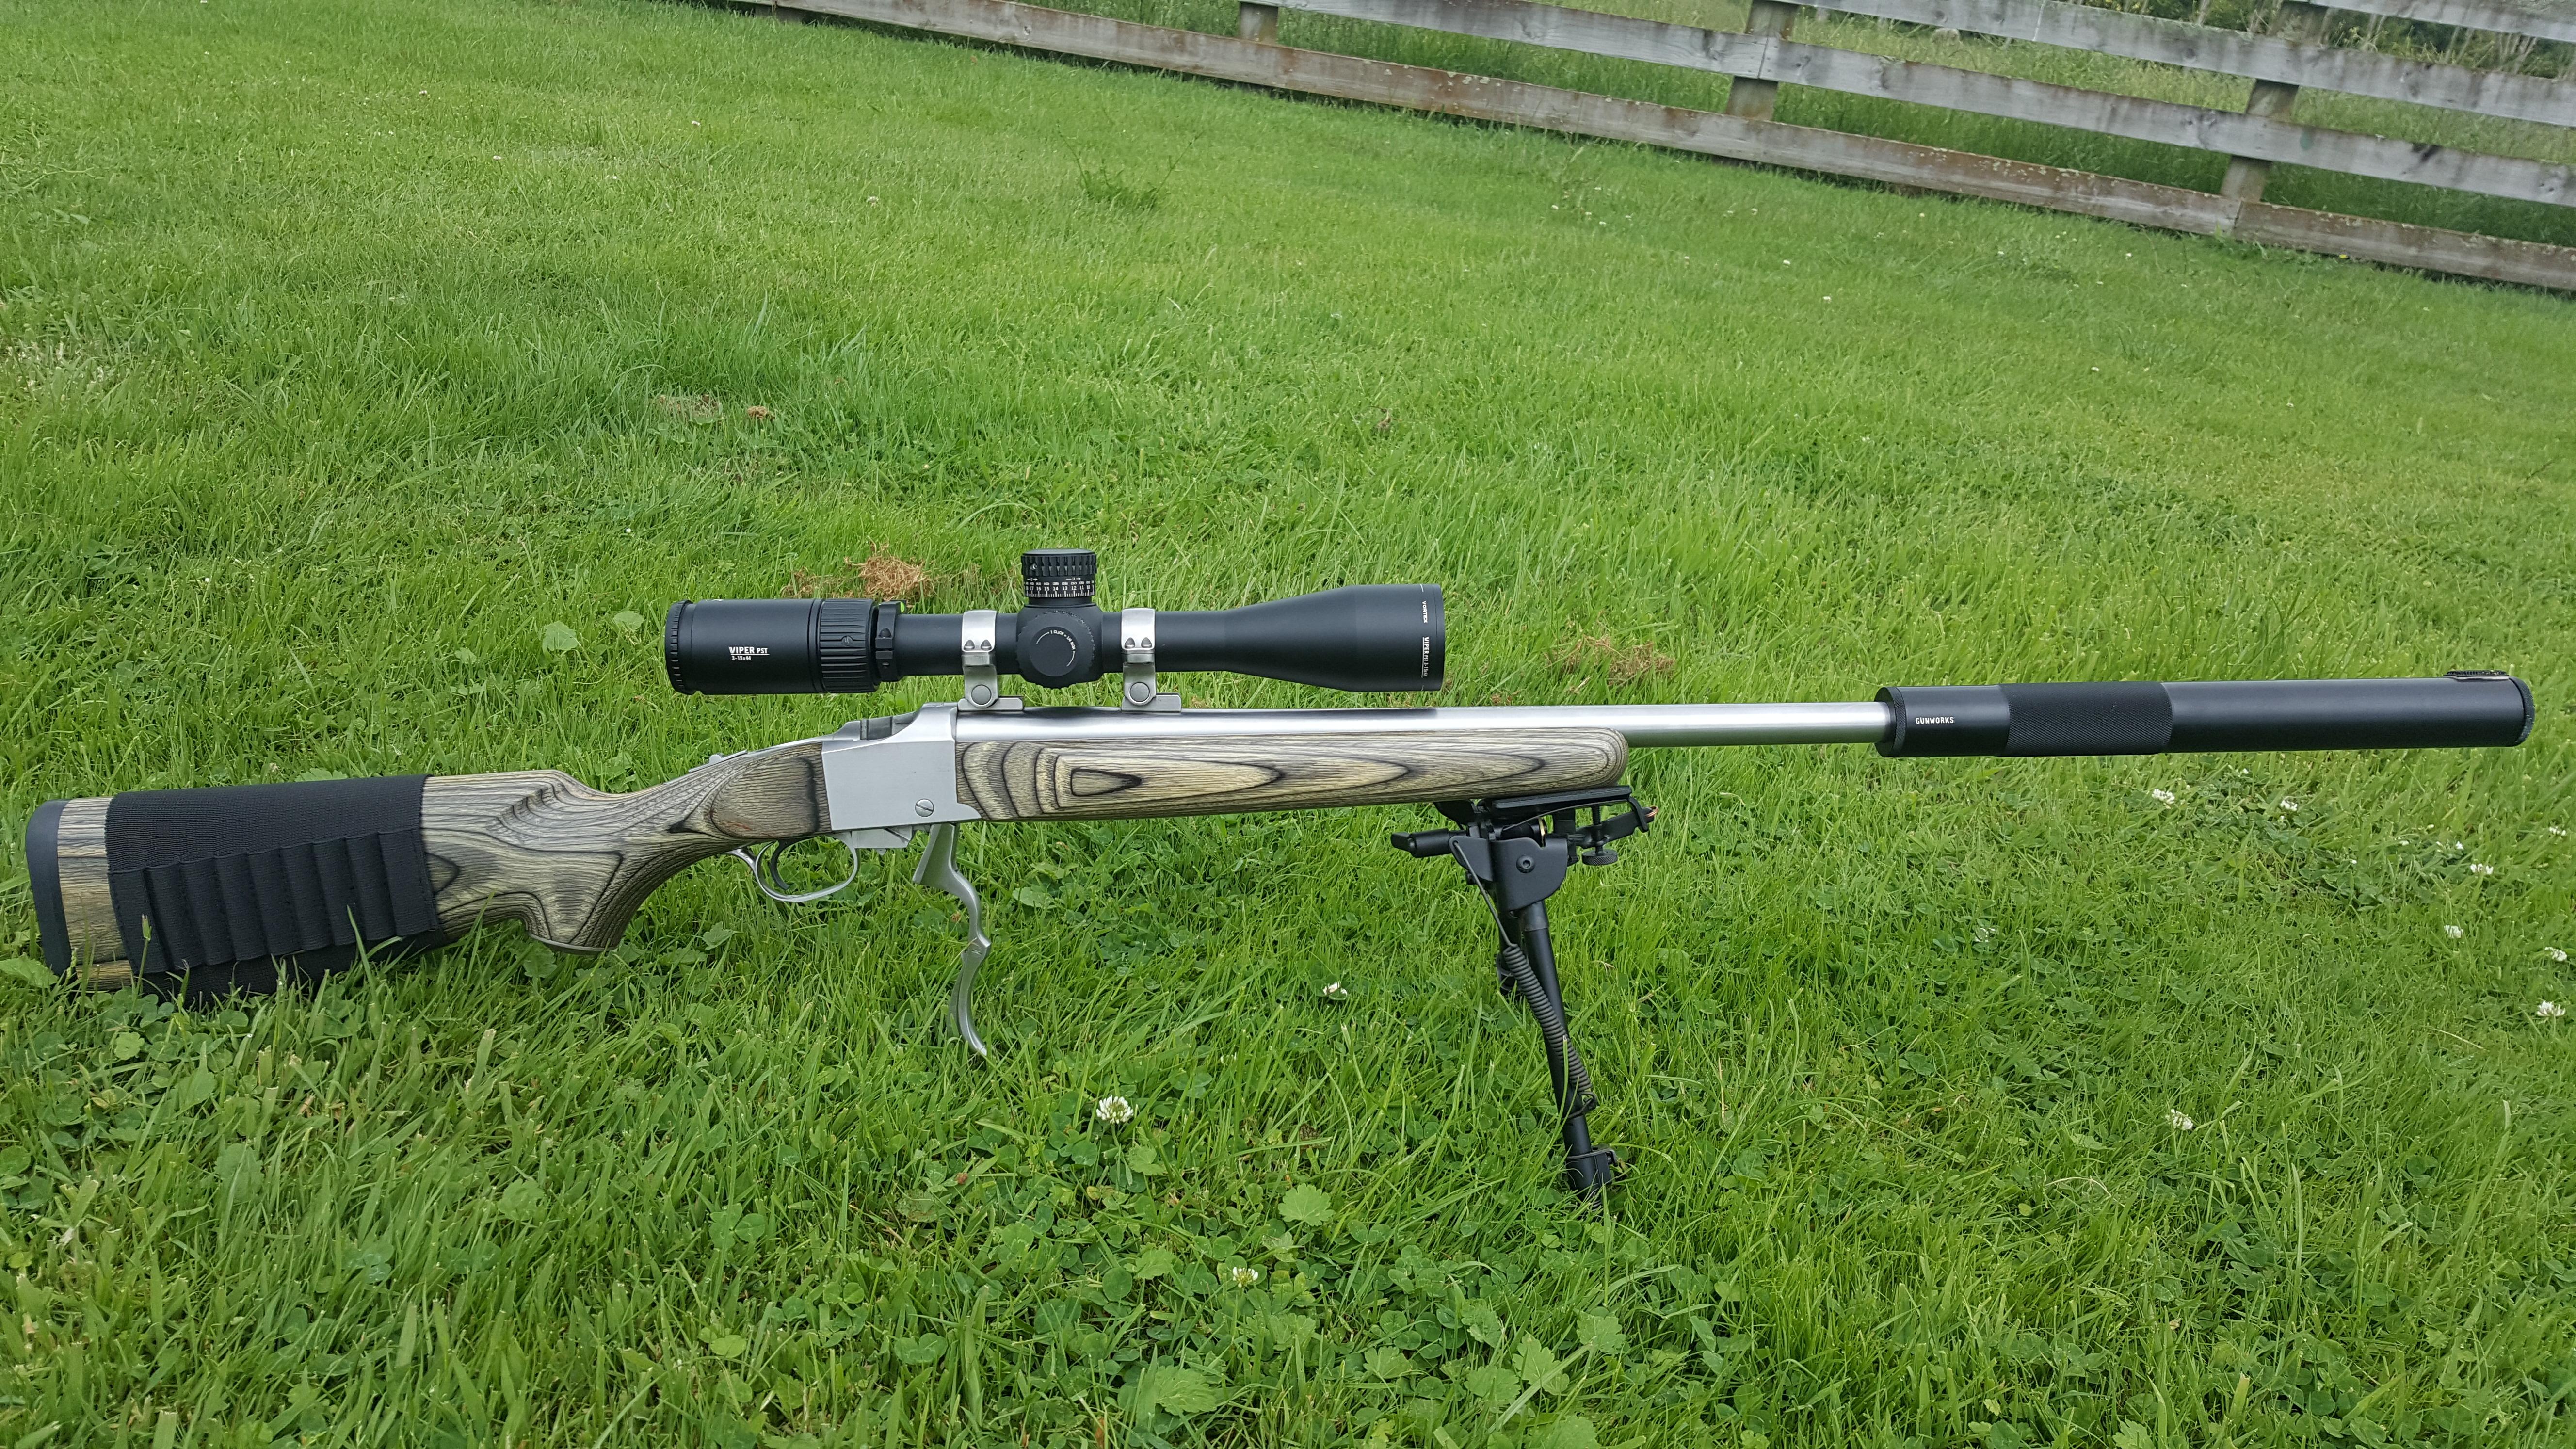 Name:  Ruger No.1 .204 SS Laminate Stock  Vortex Viper PST Gen II 3-15x44 Gunworks Suppressor 1.jpg Views: 197 Size:  7.03 MB